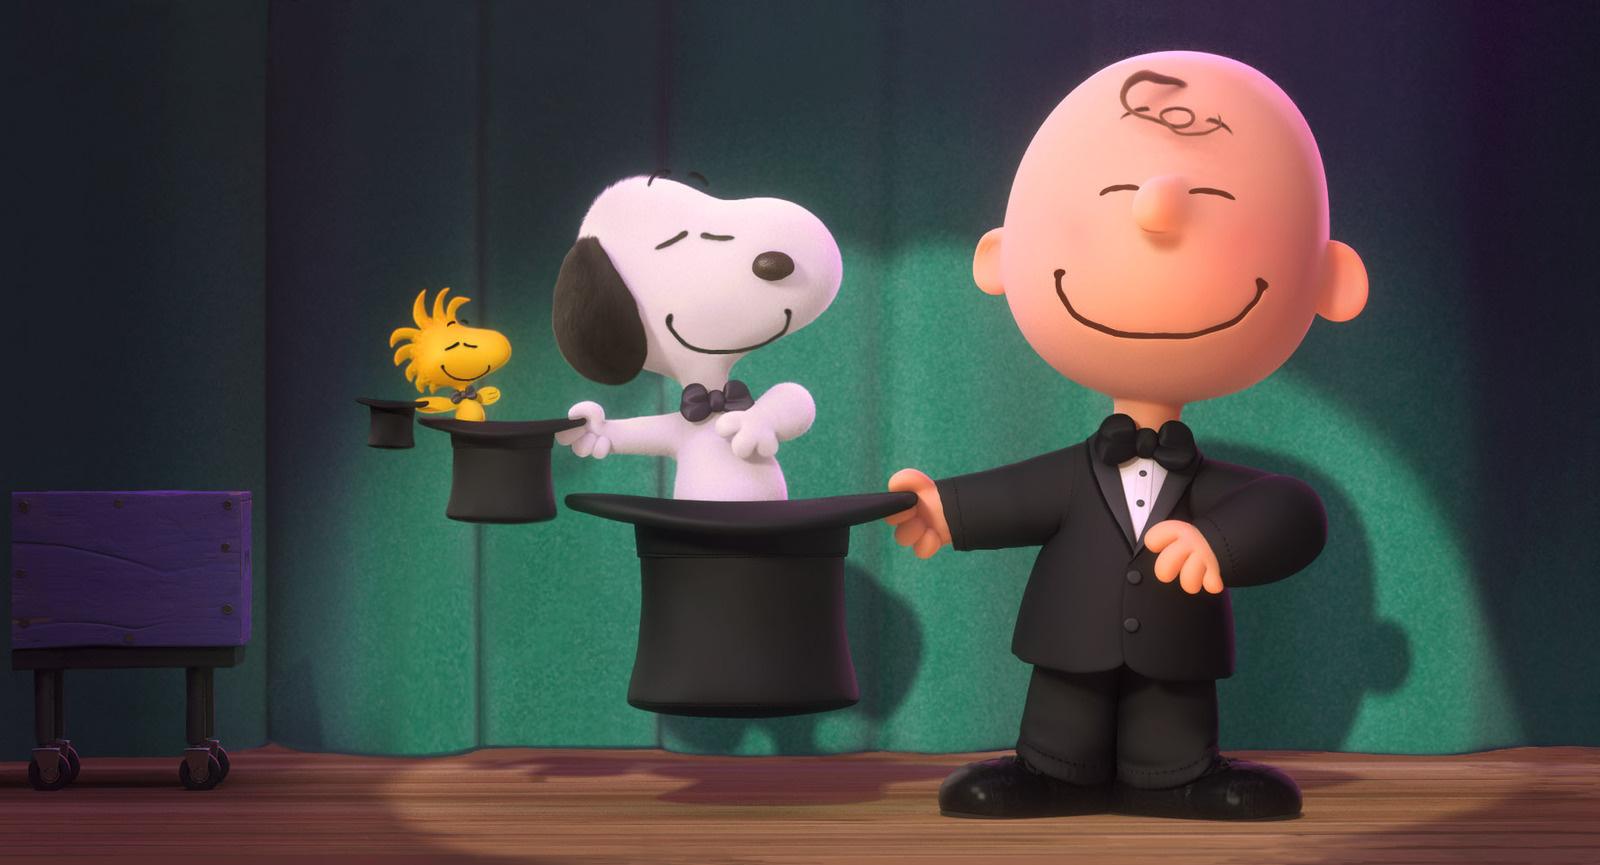 Snoopy et les Peanuts : un amour de film ♥